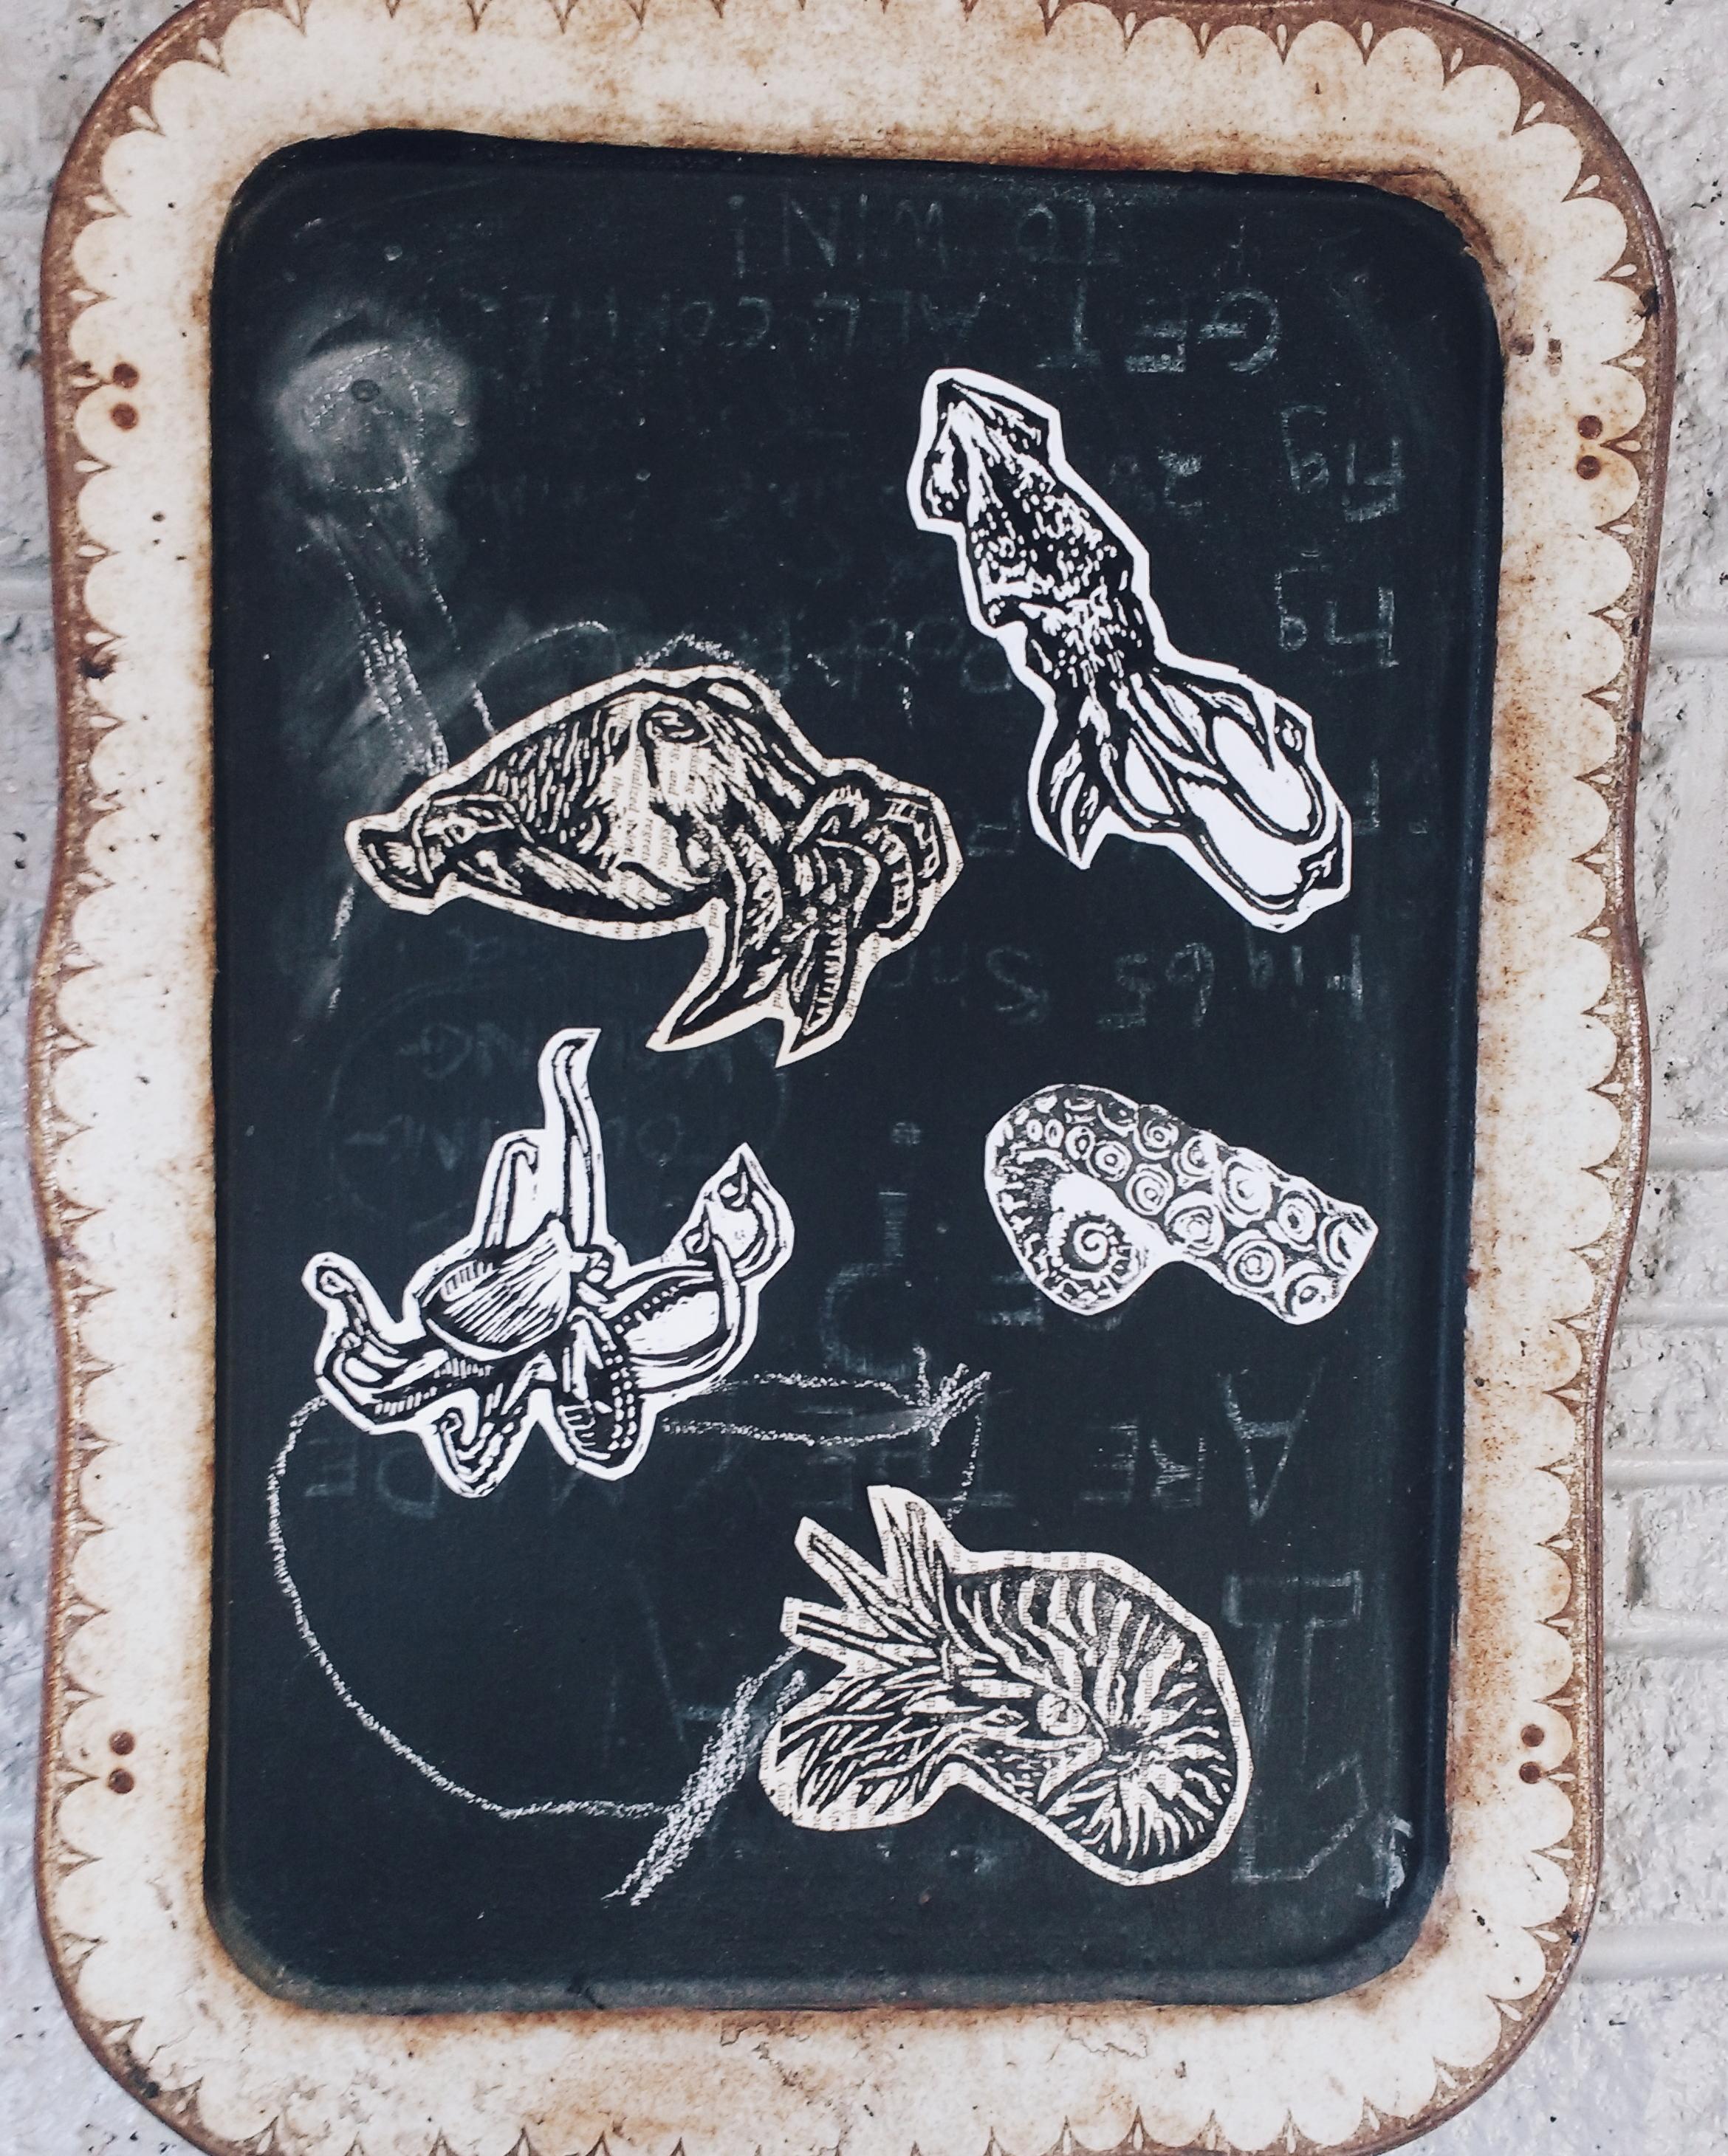 Cephalopods.